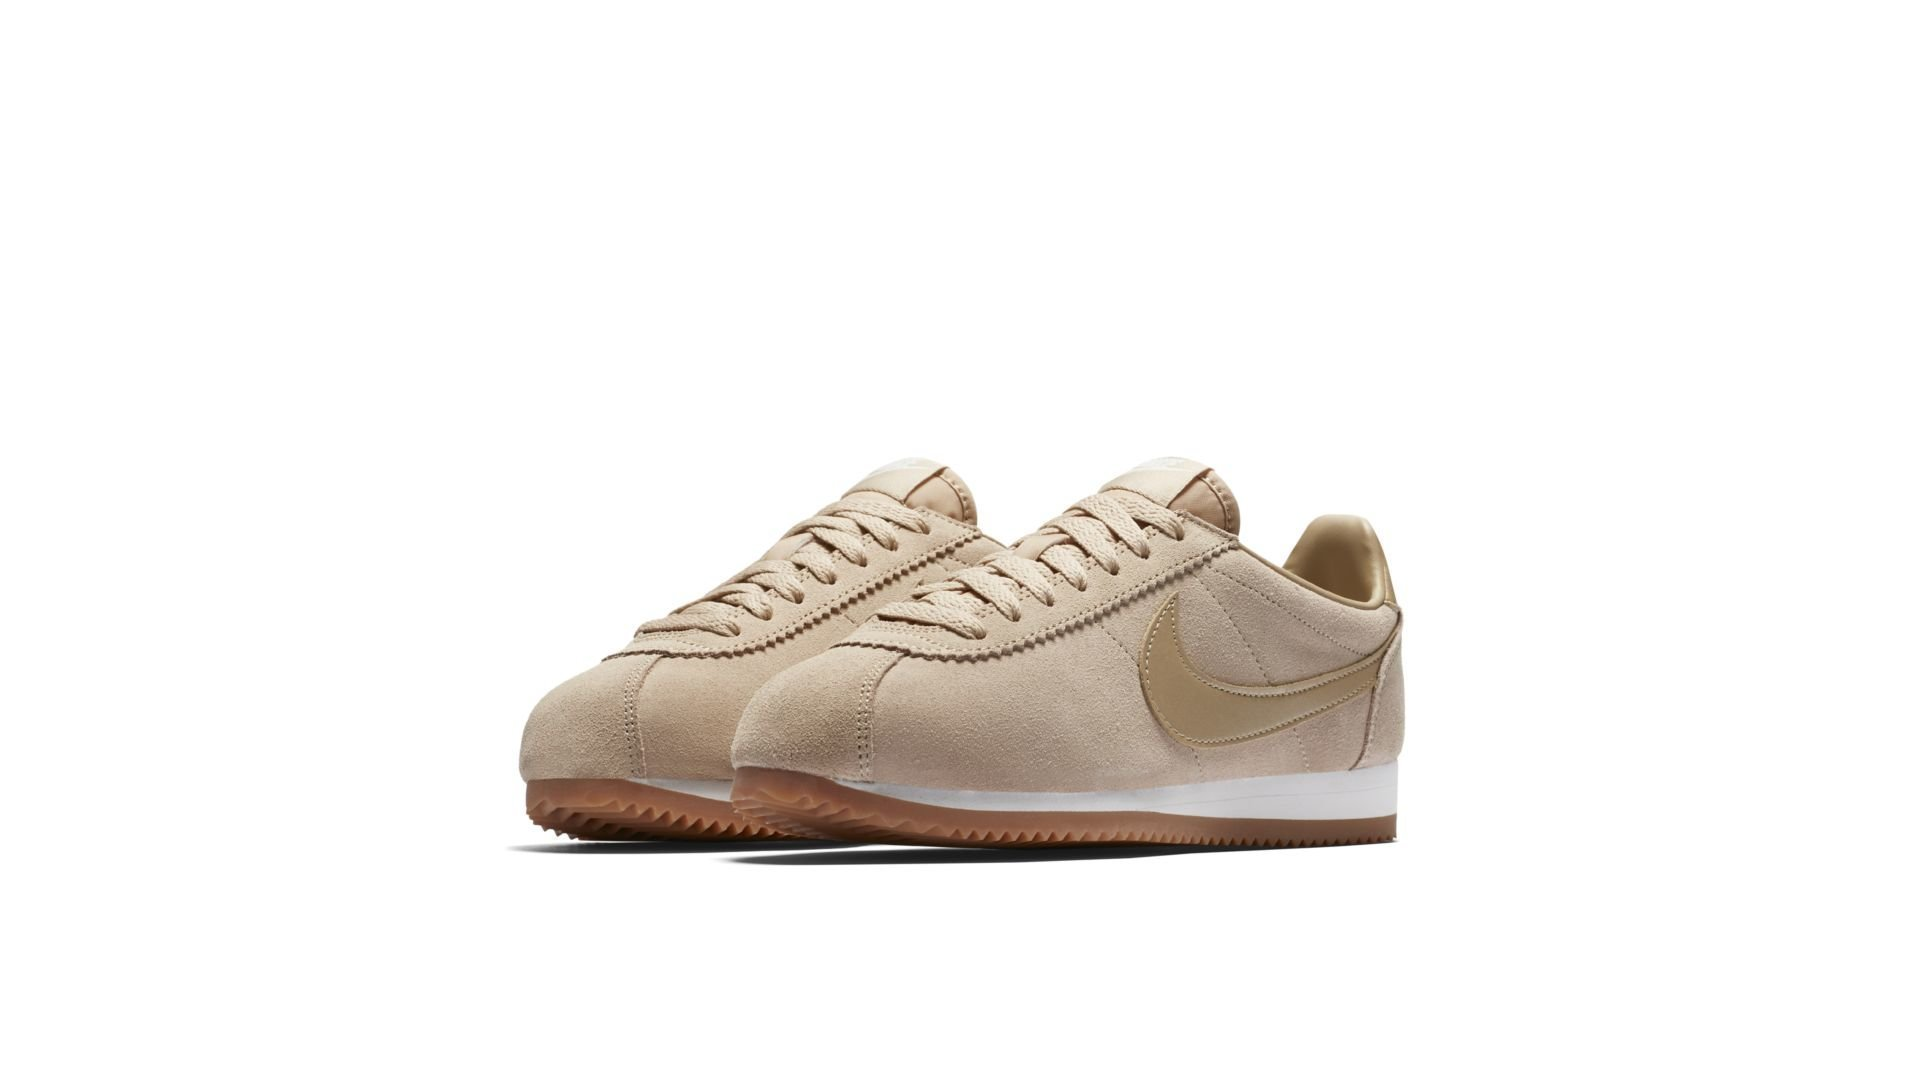 Nike Classic Cortez Suede Mushroom (W) (AA3839-200)